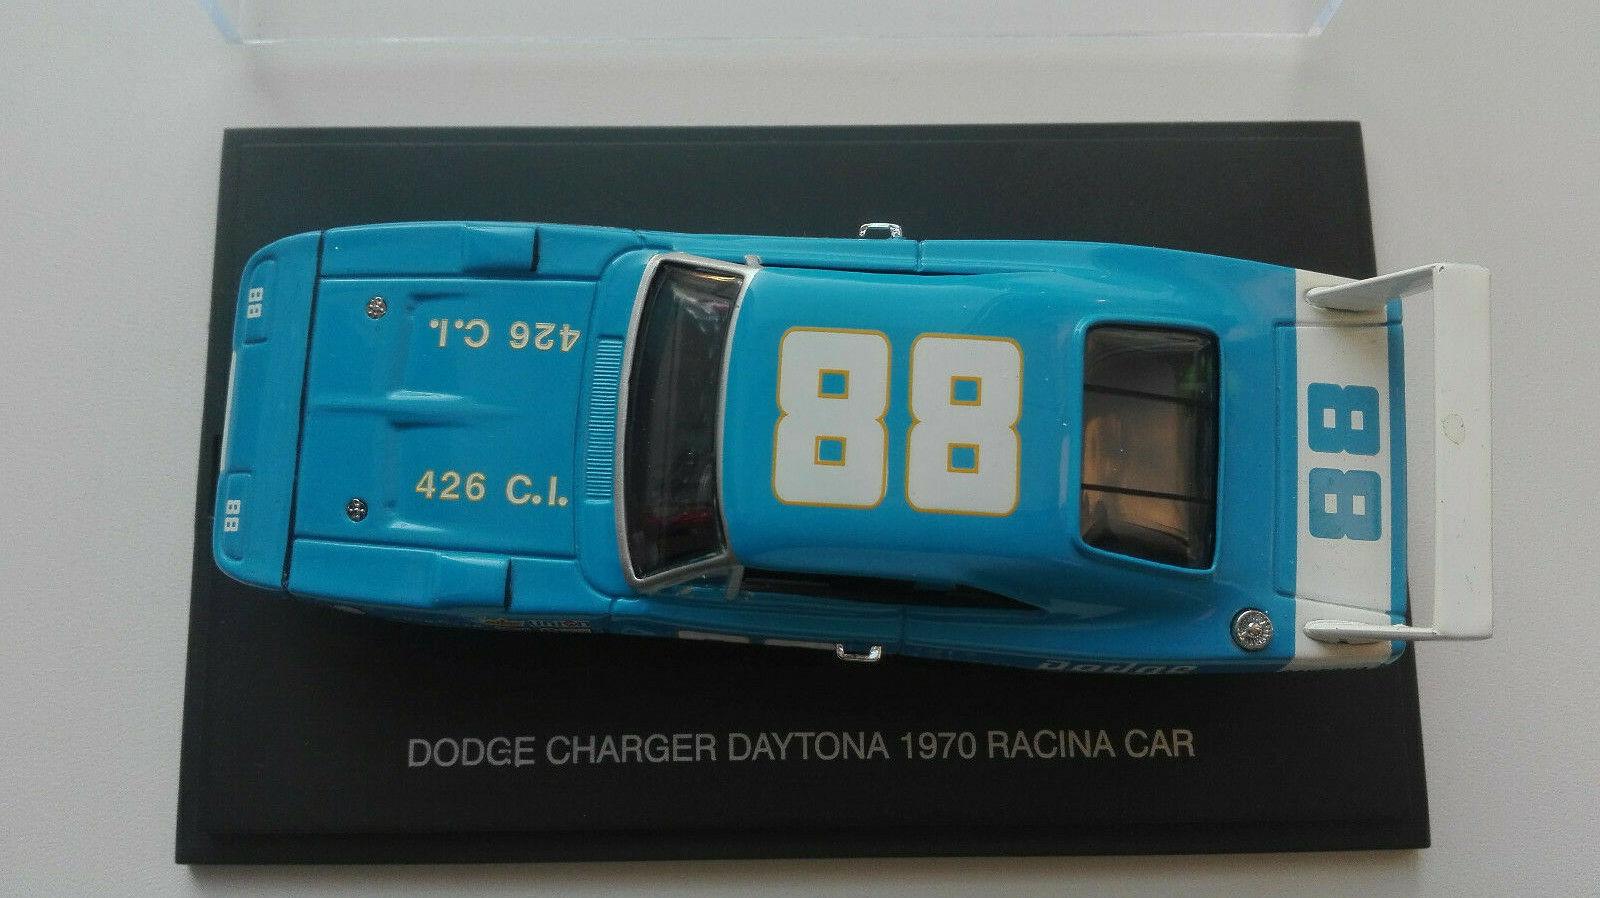 exclusivo 1 43 Dodge Charger Daytona Daytona Daytona  88 1970 Universal Hobbies Raro Exc.  al precio mas bajo